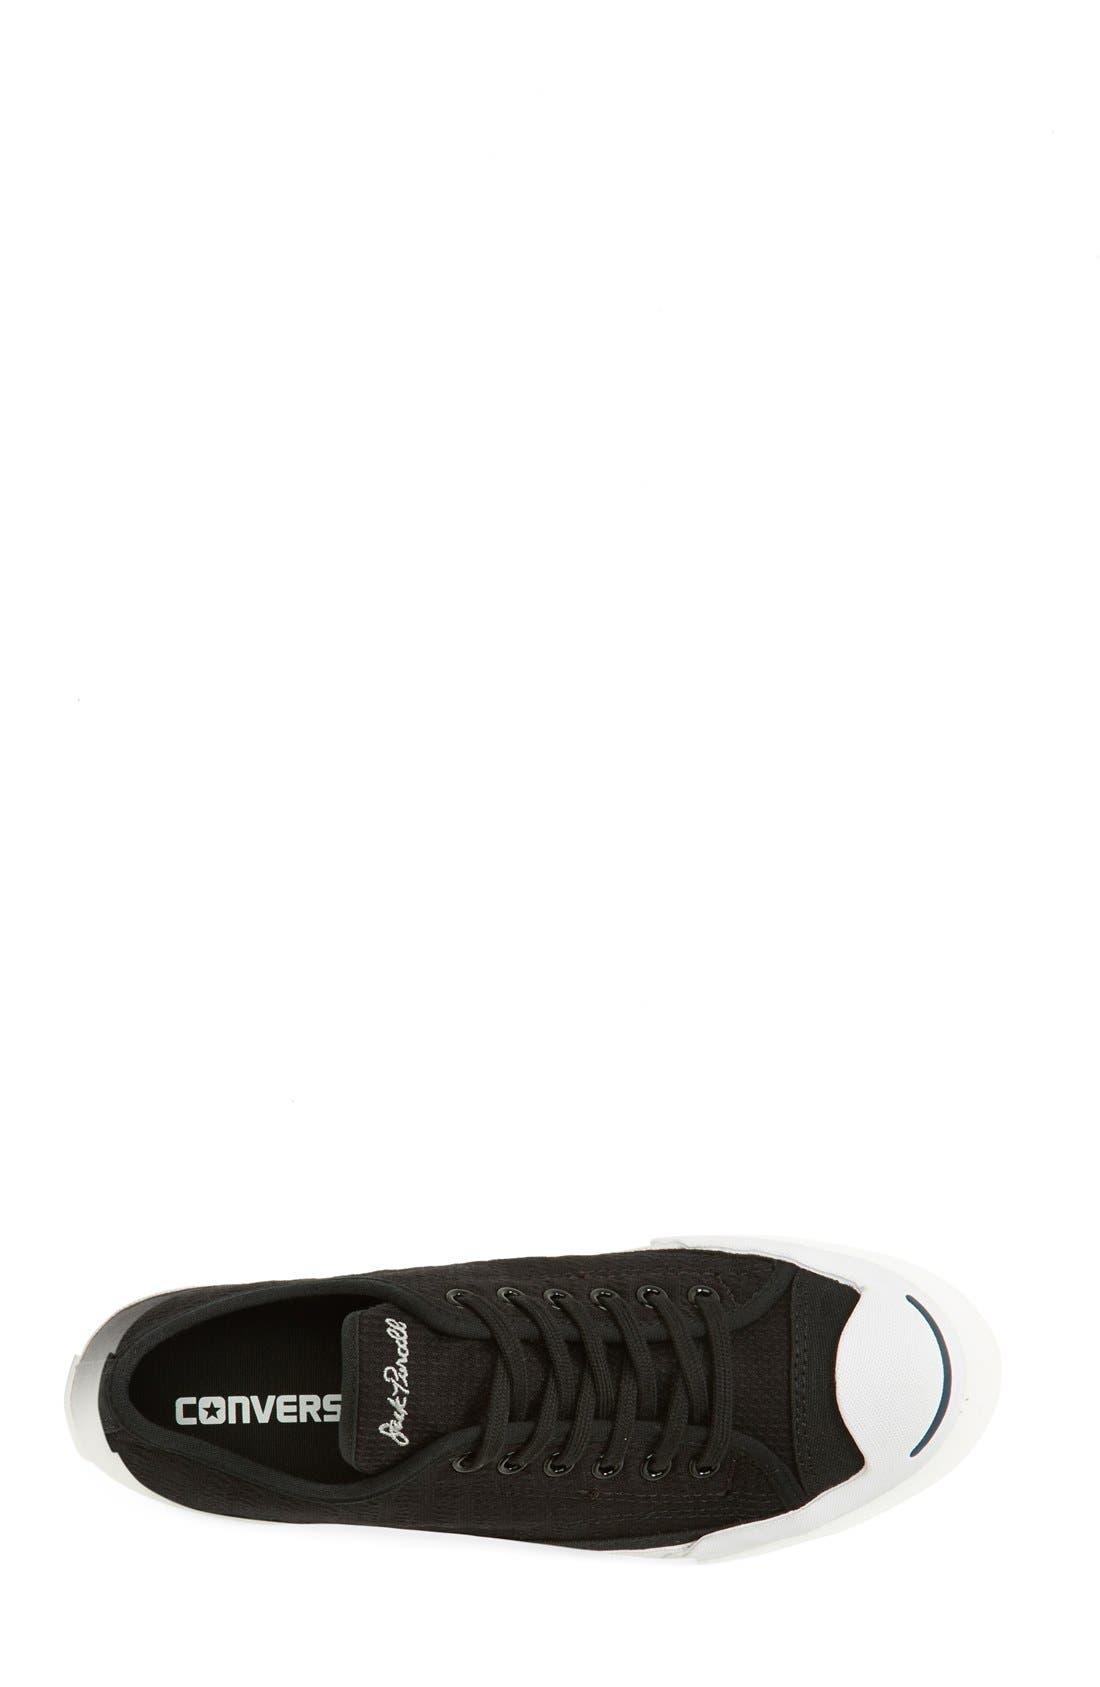 Alternate Image 3  - Converse 'Jack Purcell' Garment Dye Low Top Sneaker (Women) (Nordstrom Exclusive)